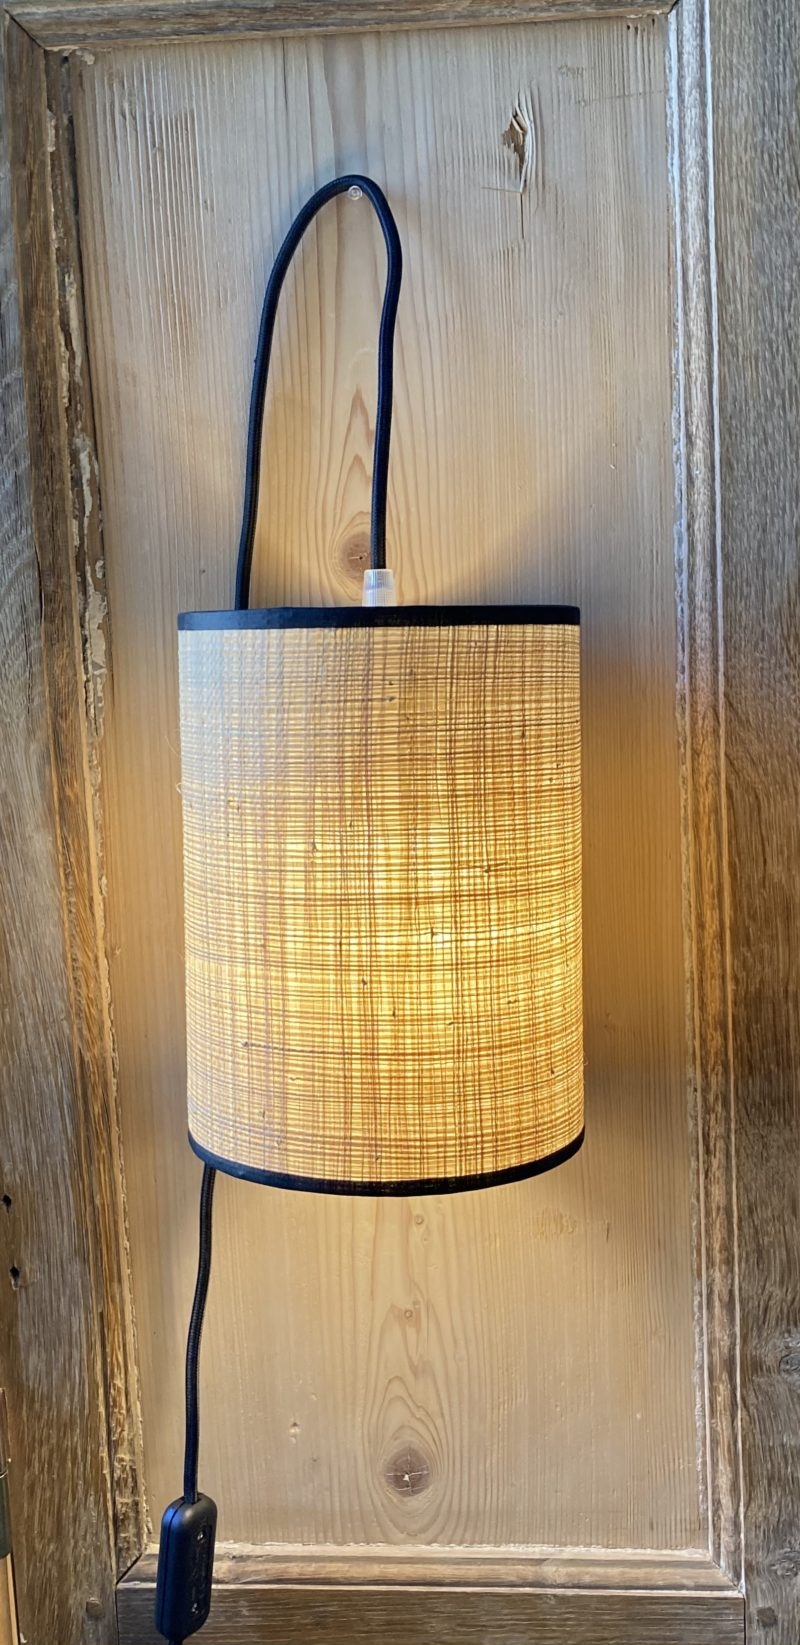 magasin luminaire lyon lampe baladeuse rabane abat jour sur mesure rafia